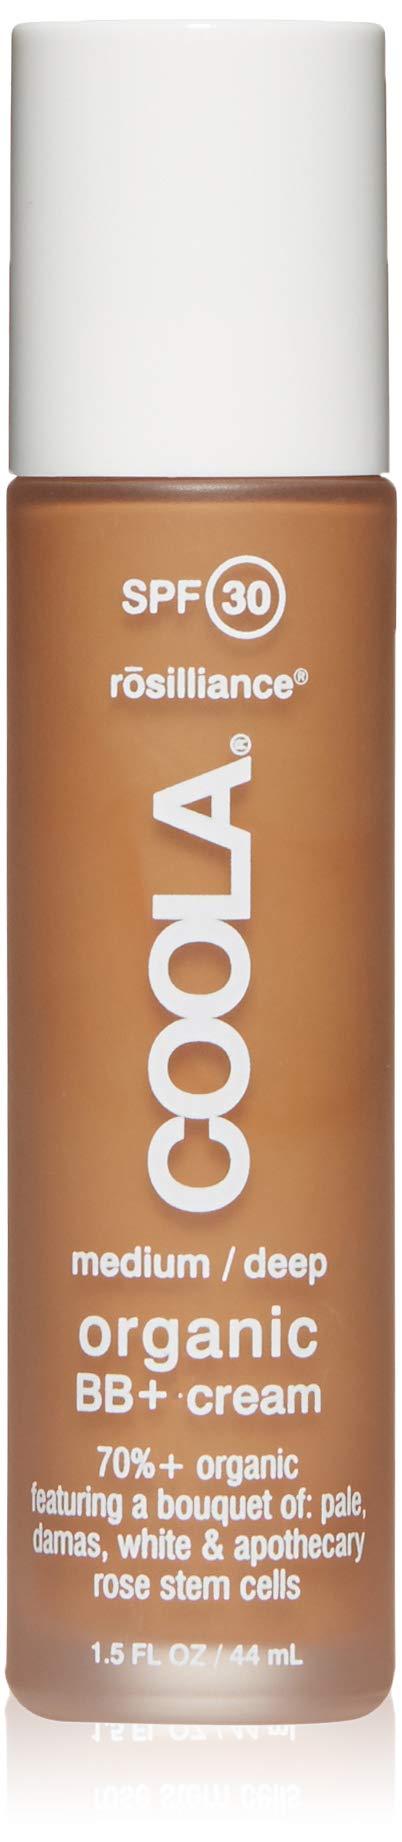 COOLA Rosilliance Mineral BB+ Cream Tinted Organic Sunscreen | Broad Spectrum SPF 30 | Vegan | Water-Resistant | Ultra-Moisturizing | Antioxidant Enriched | Medium Deep